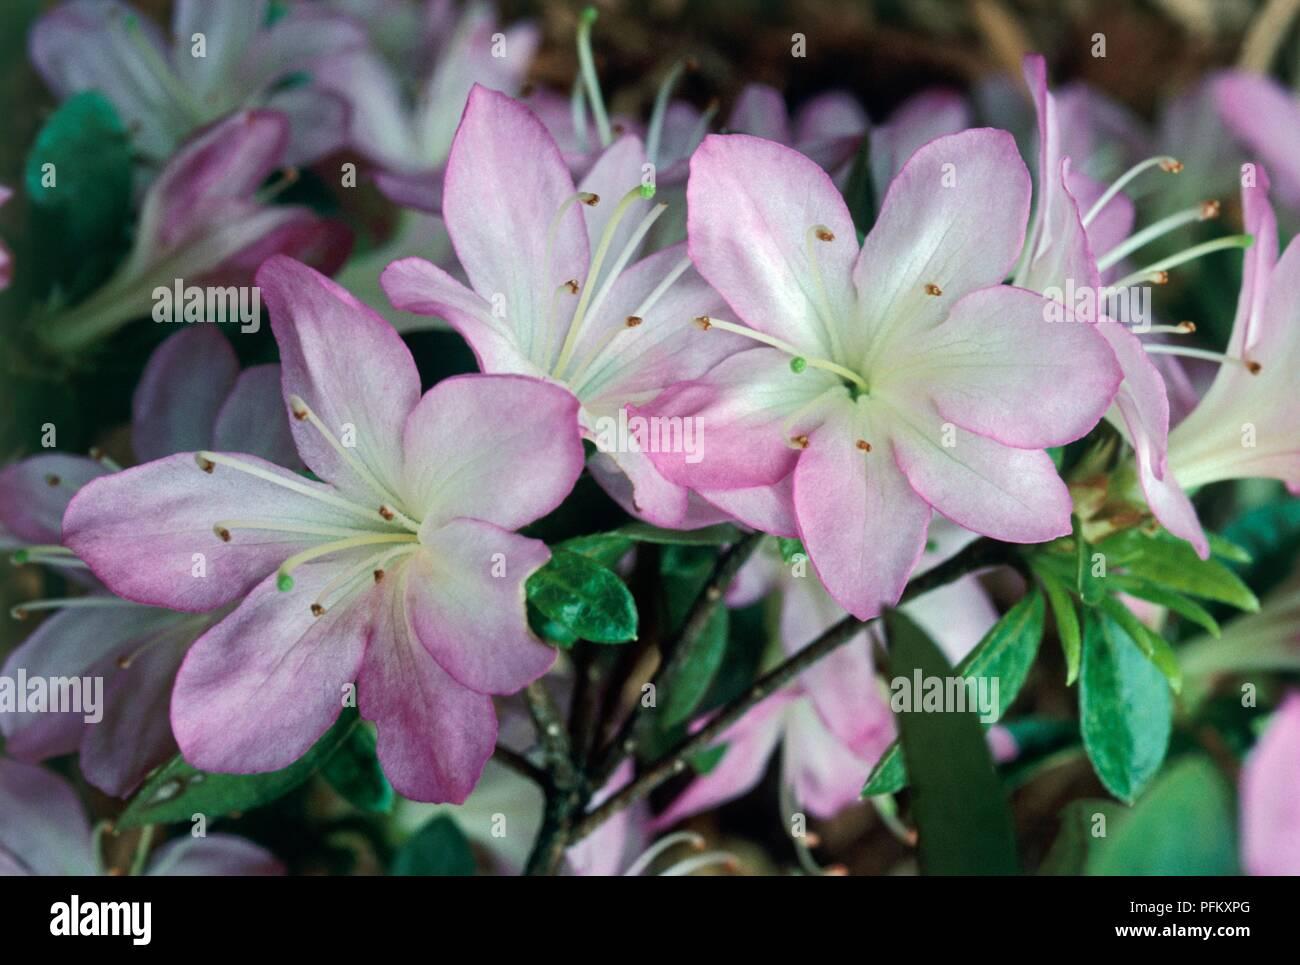 Rhododendron Irohayama Kurume Hybrid Azalea Shrub With Small